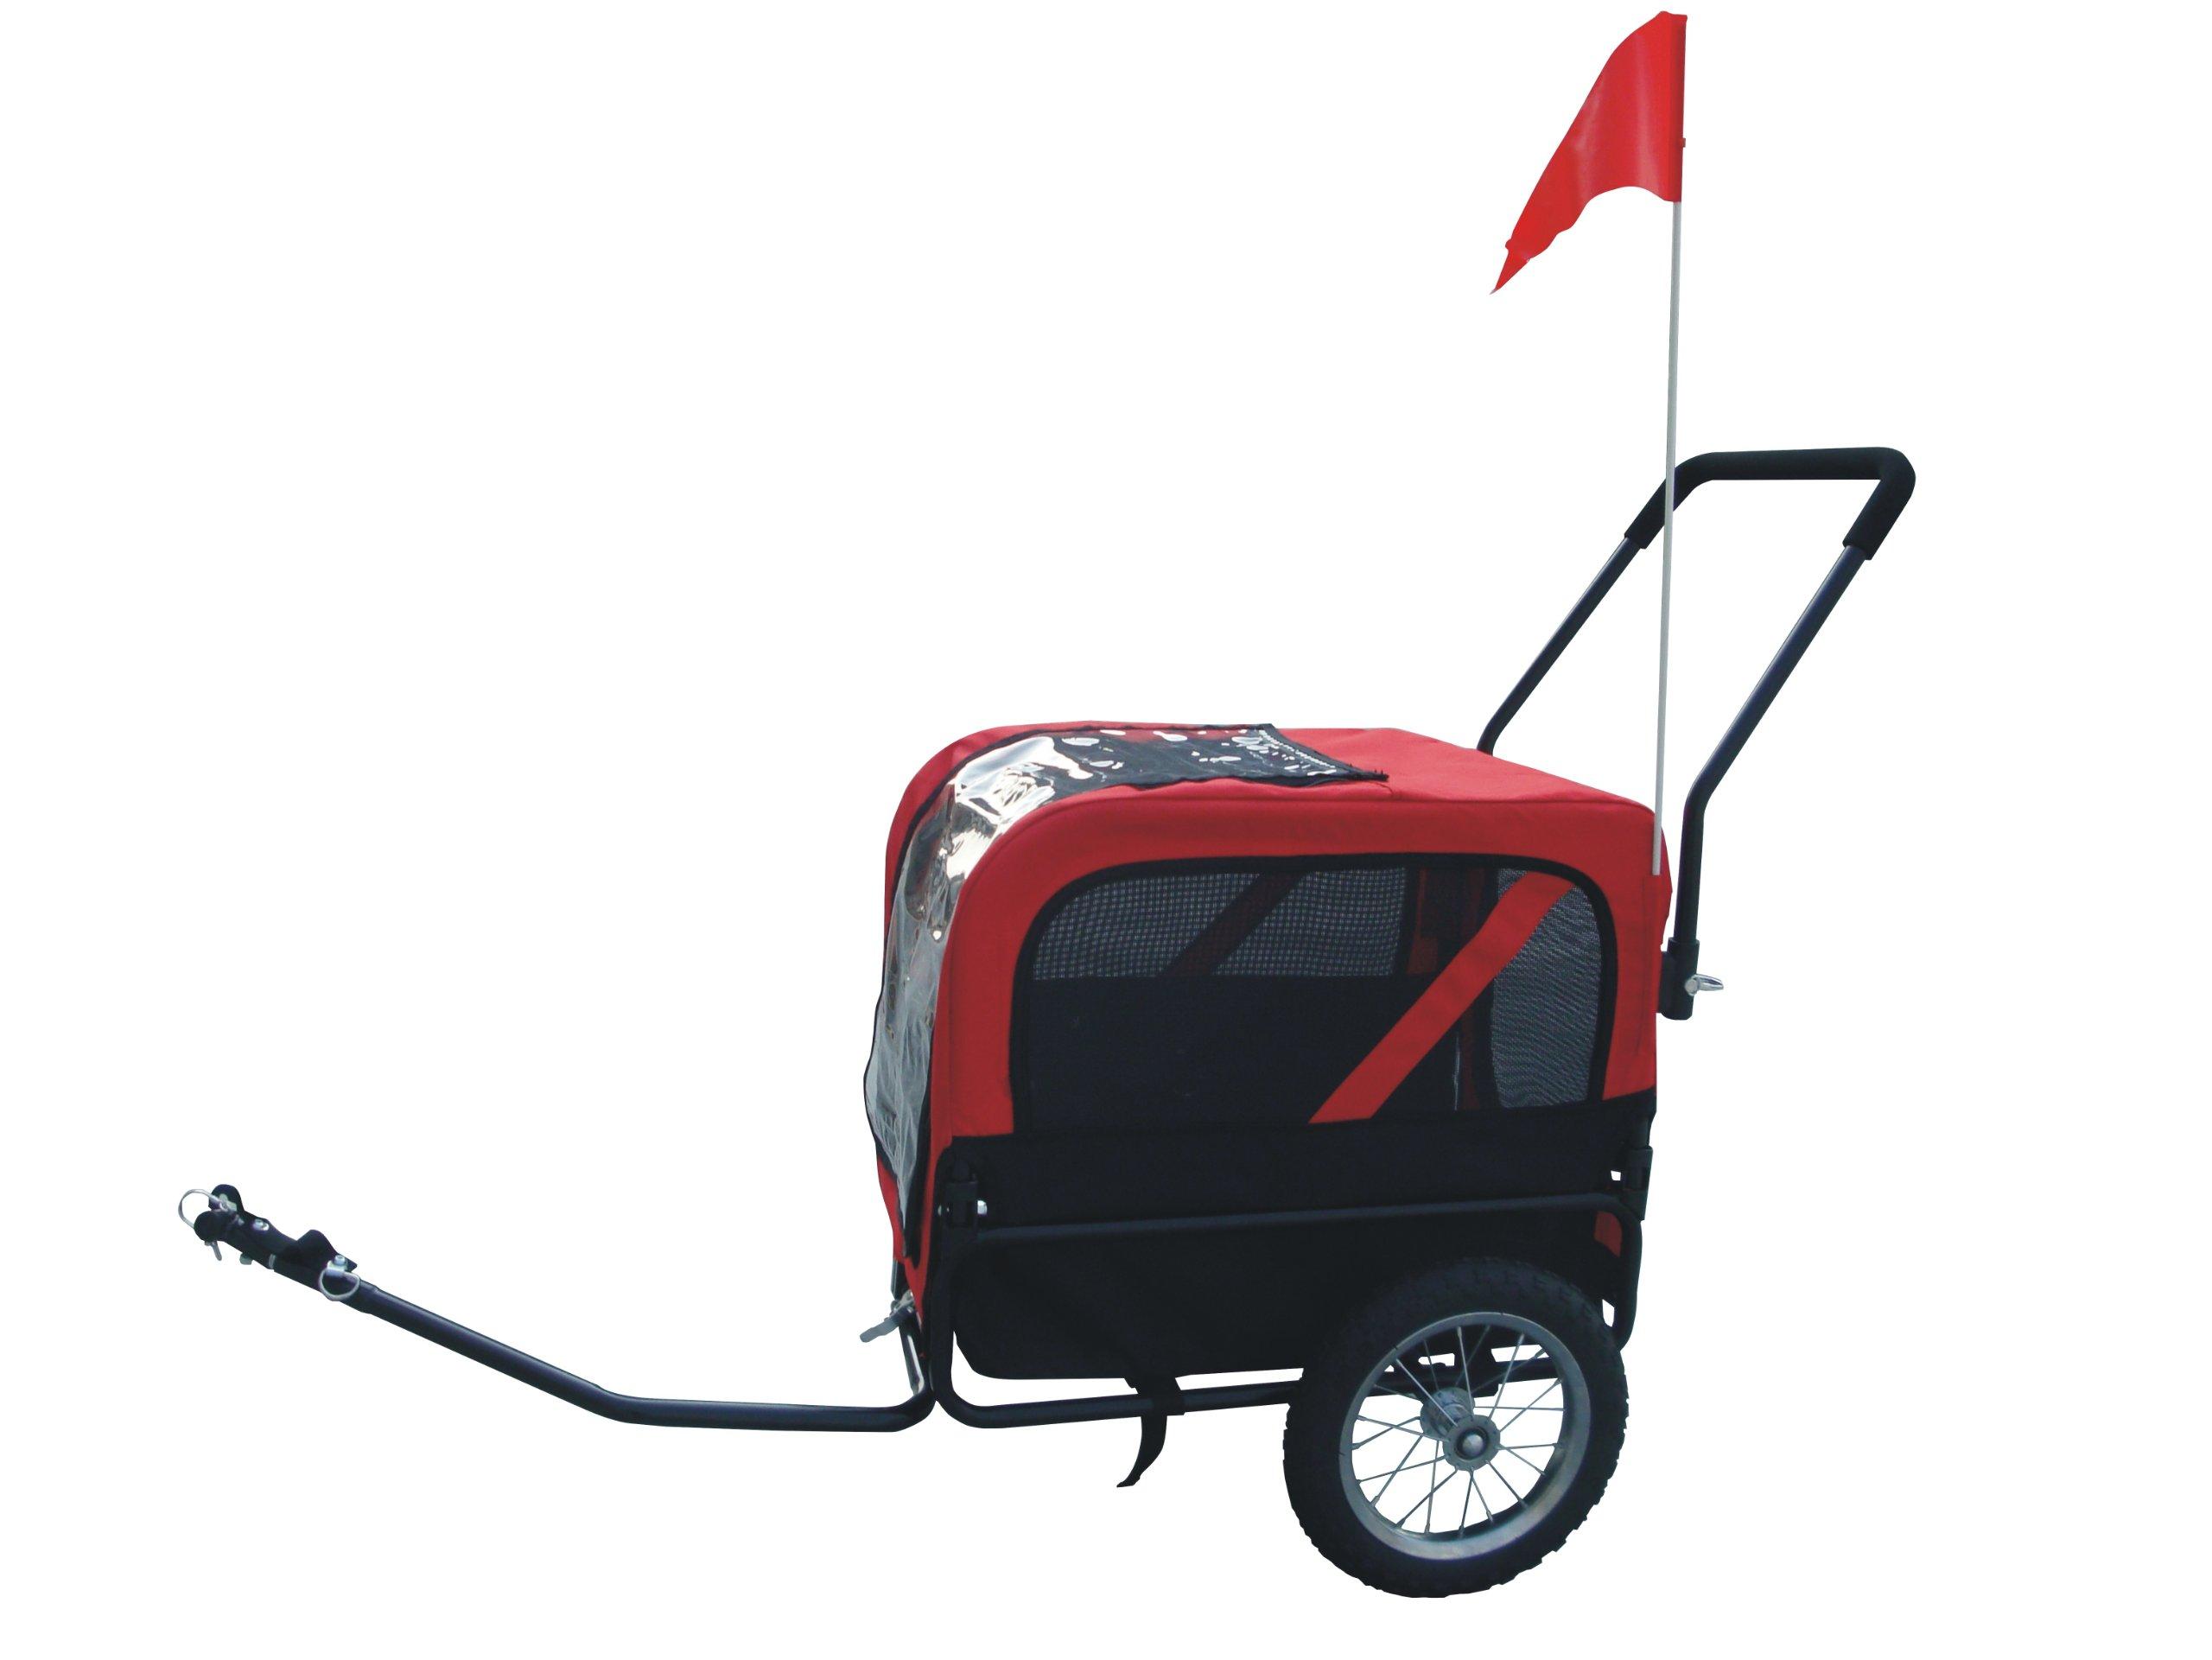 MDOG2 MK1484 Comfy Pet Bike Trailer/Jogging Stroller, Small, Red/Black by MDOG2